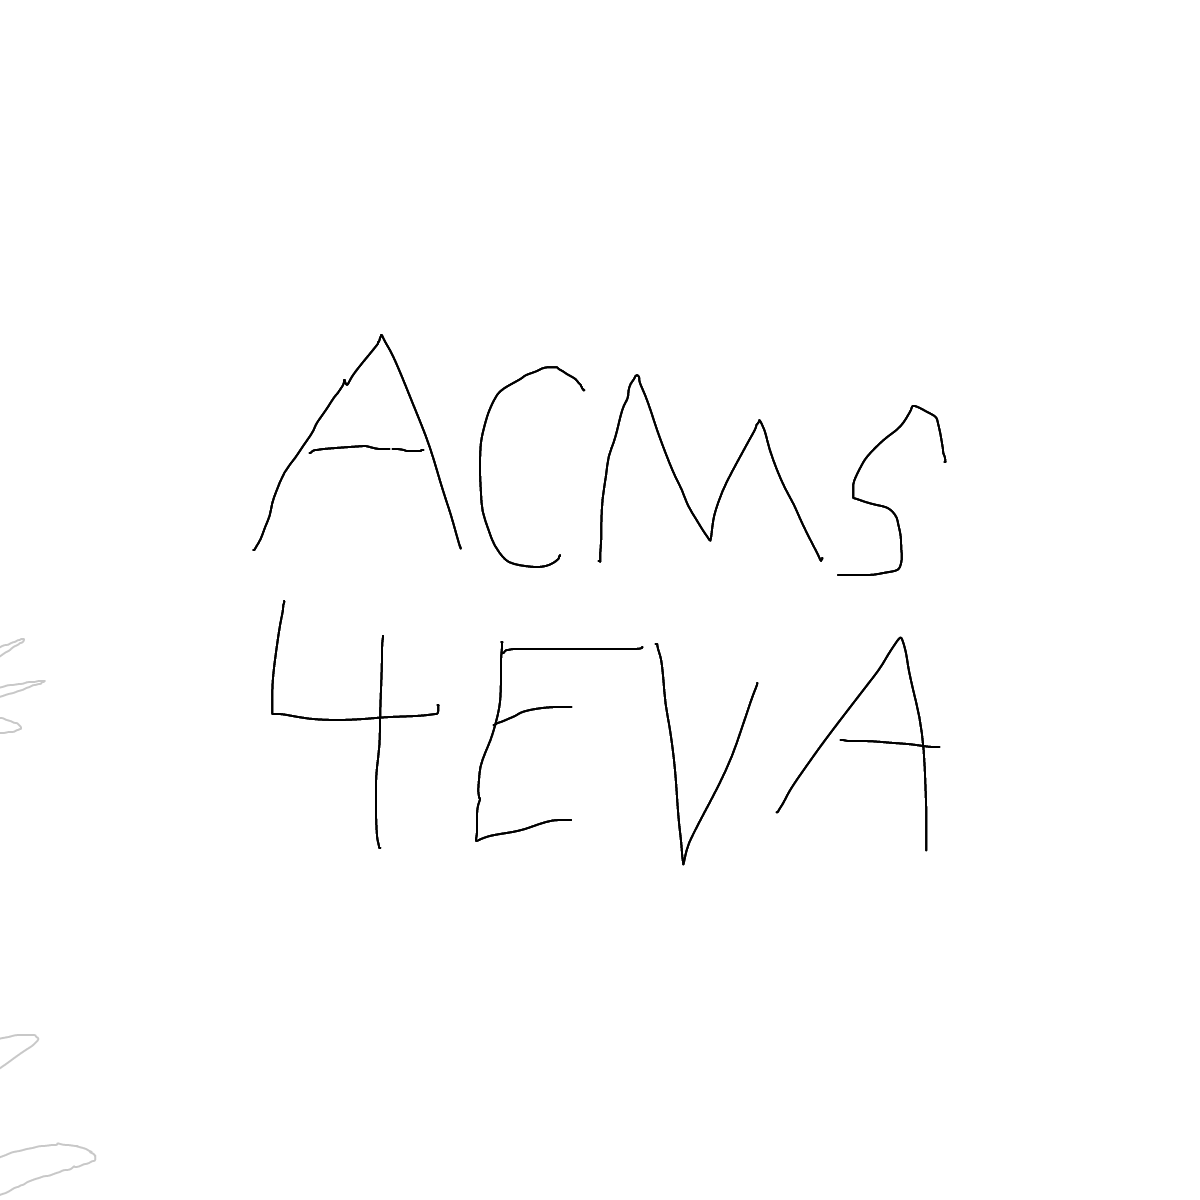 BAAAM drawing#13841 lat:32.9543342590332000lng: -96.7623672485351600